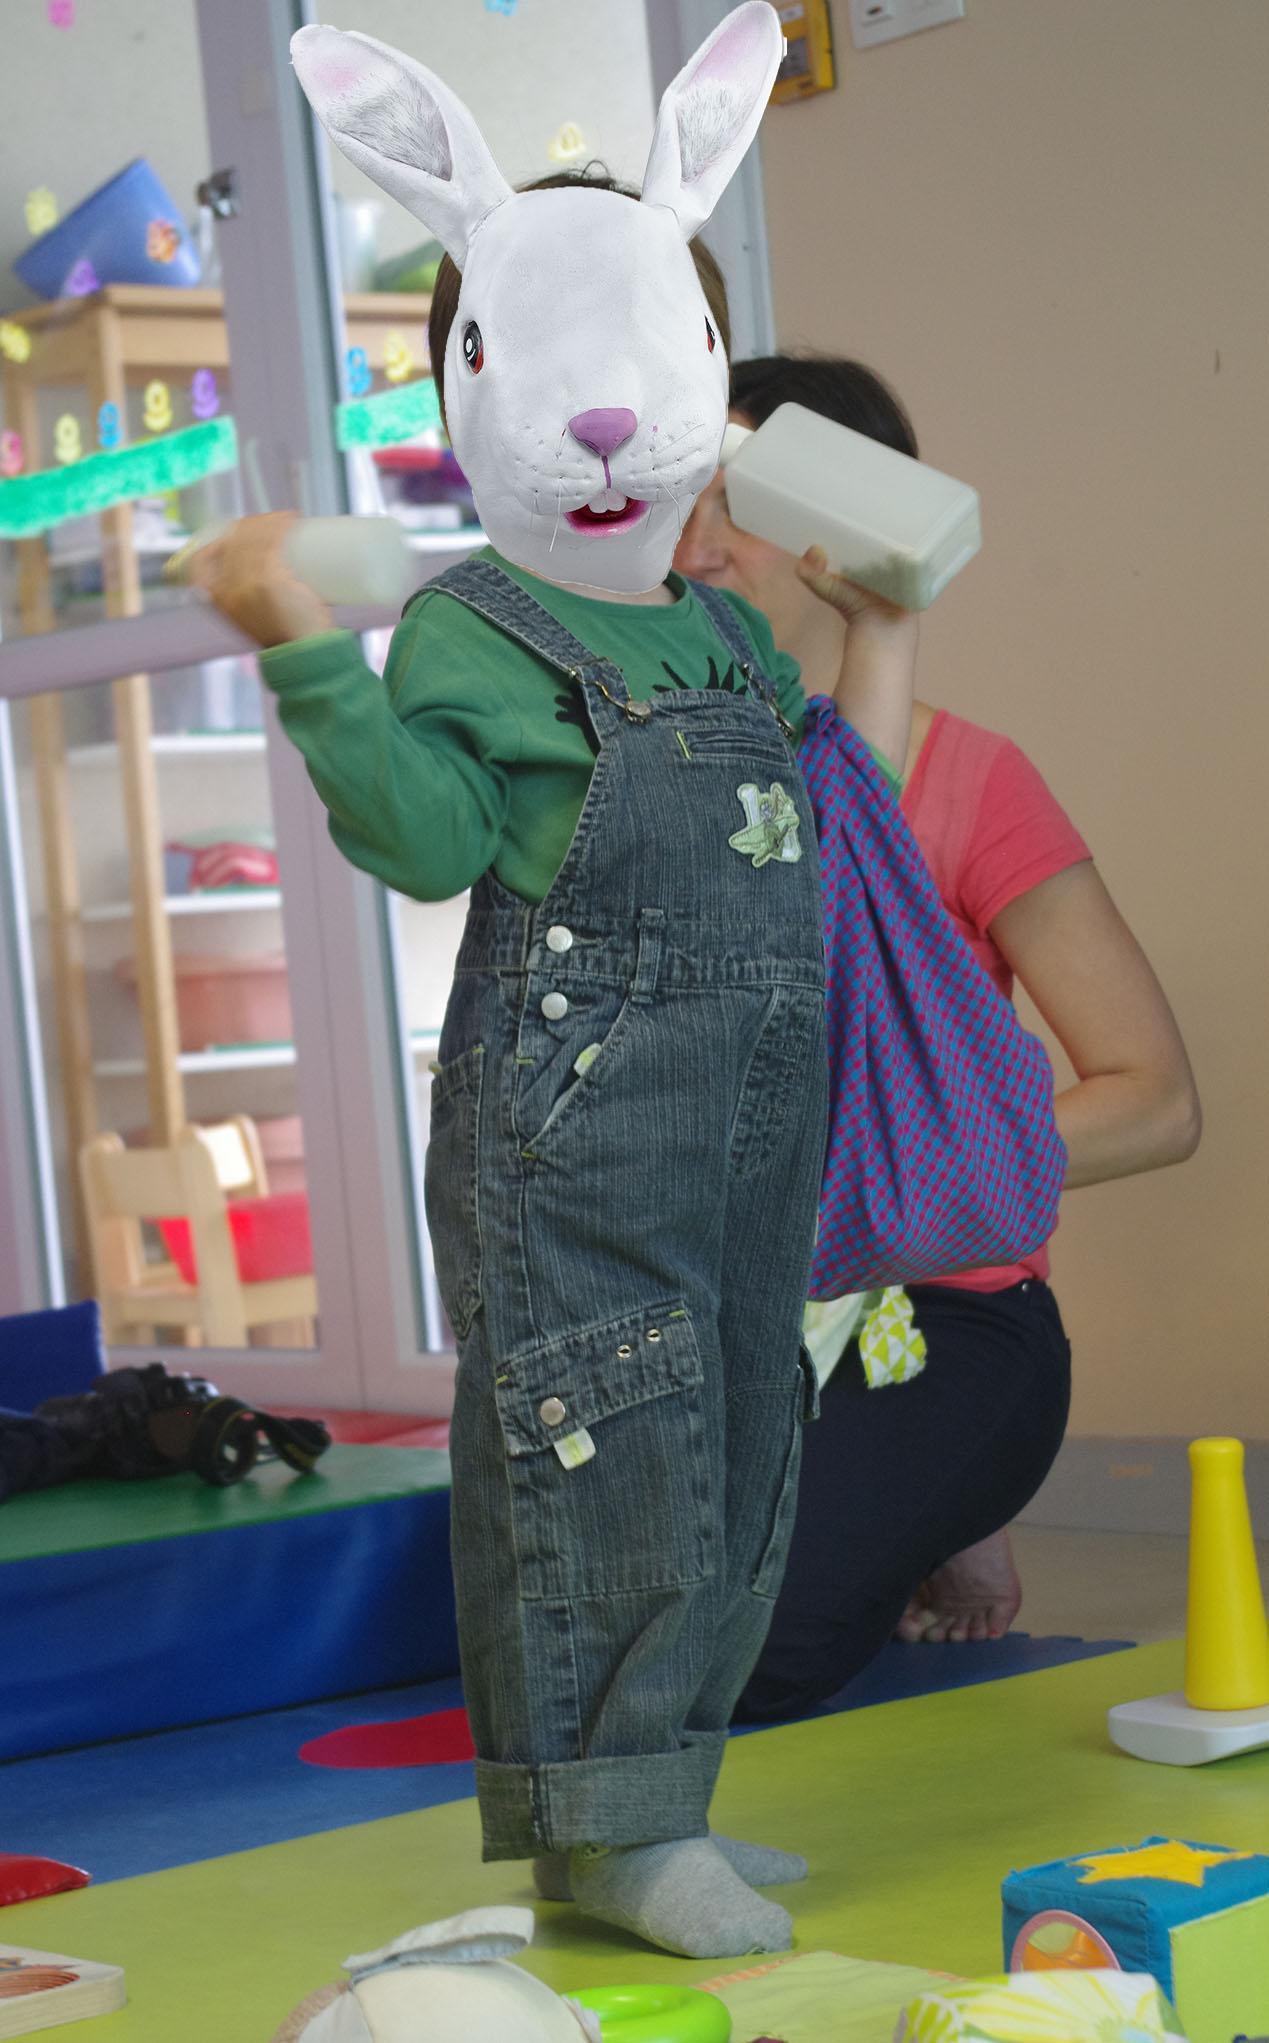 Petit lapin au baluchon à l'Atelier Furoshiki à petit pas